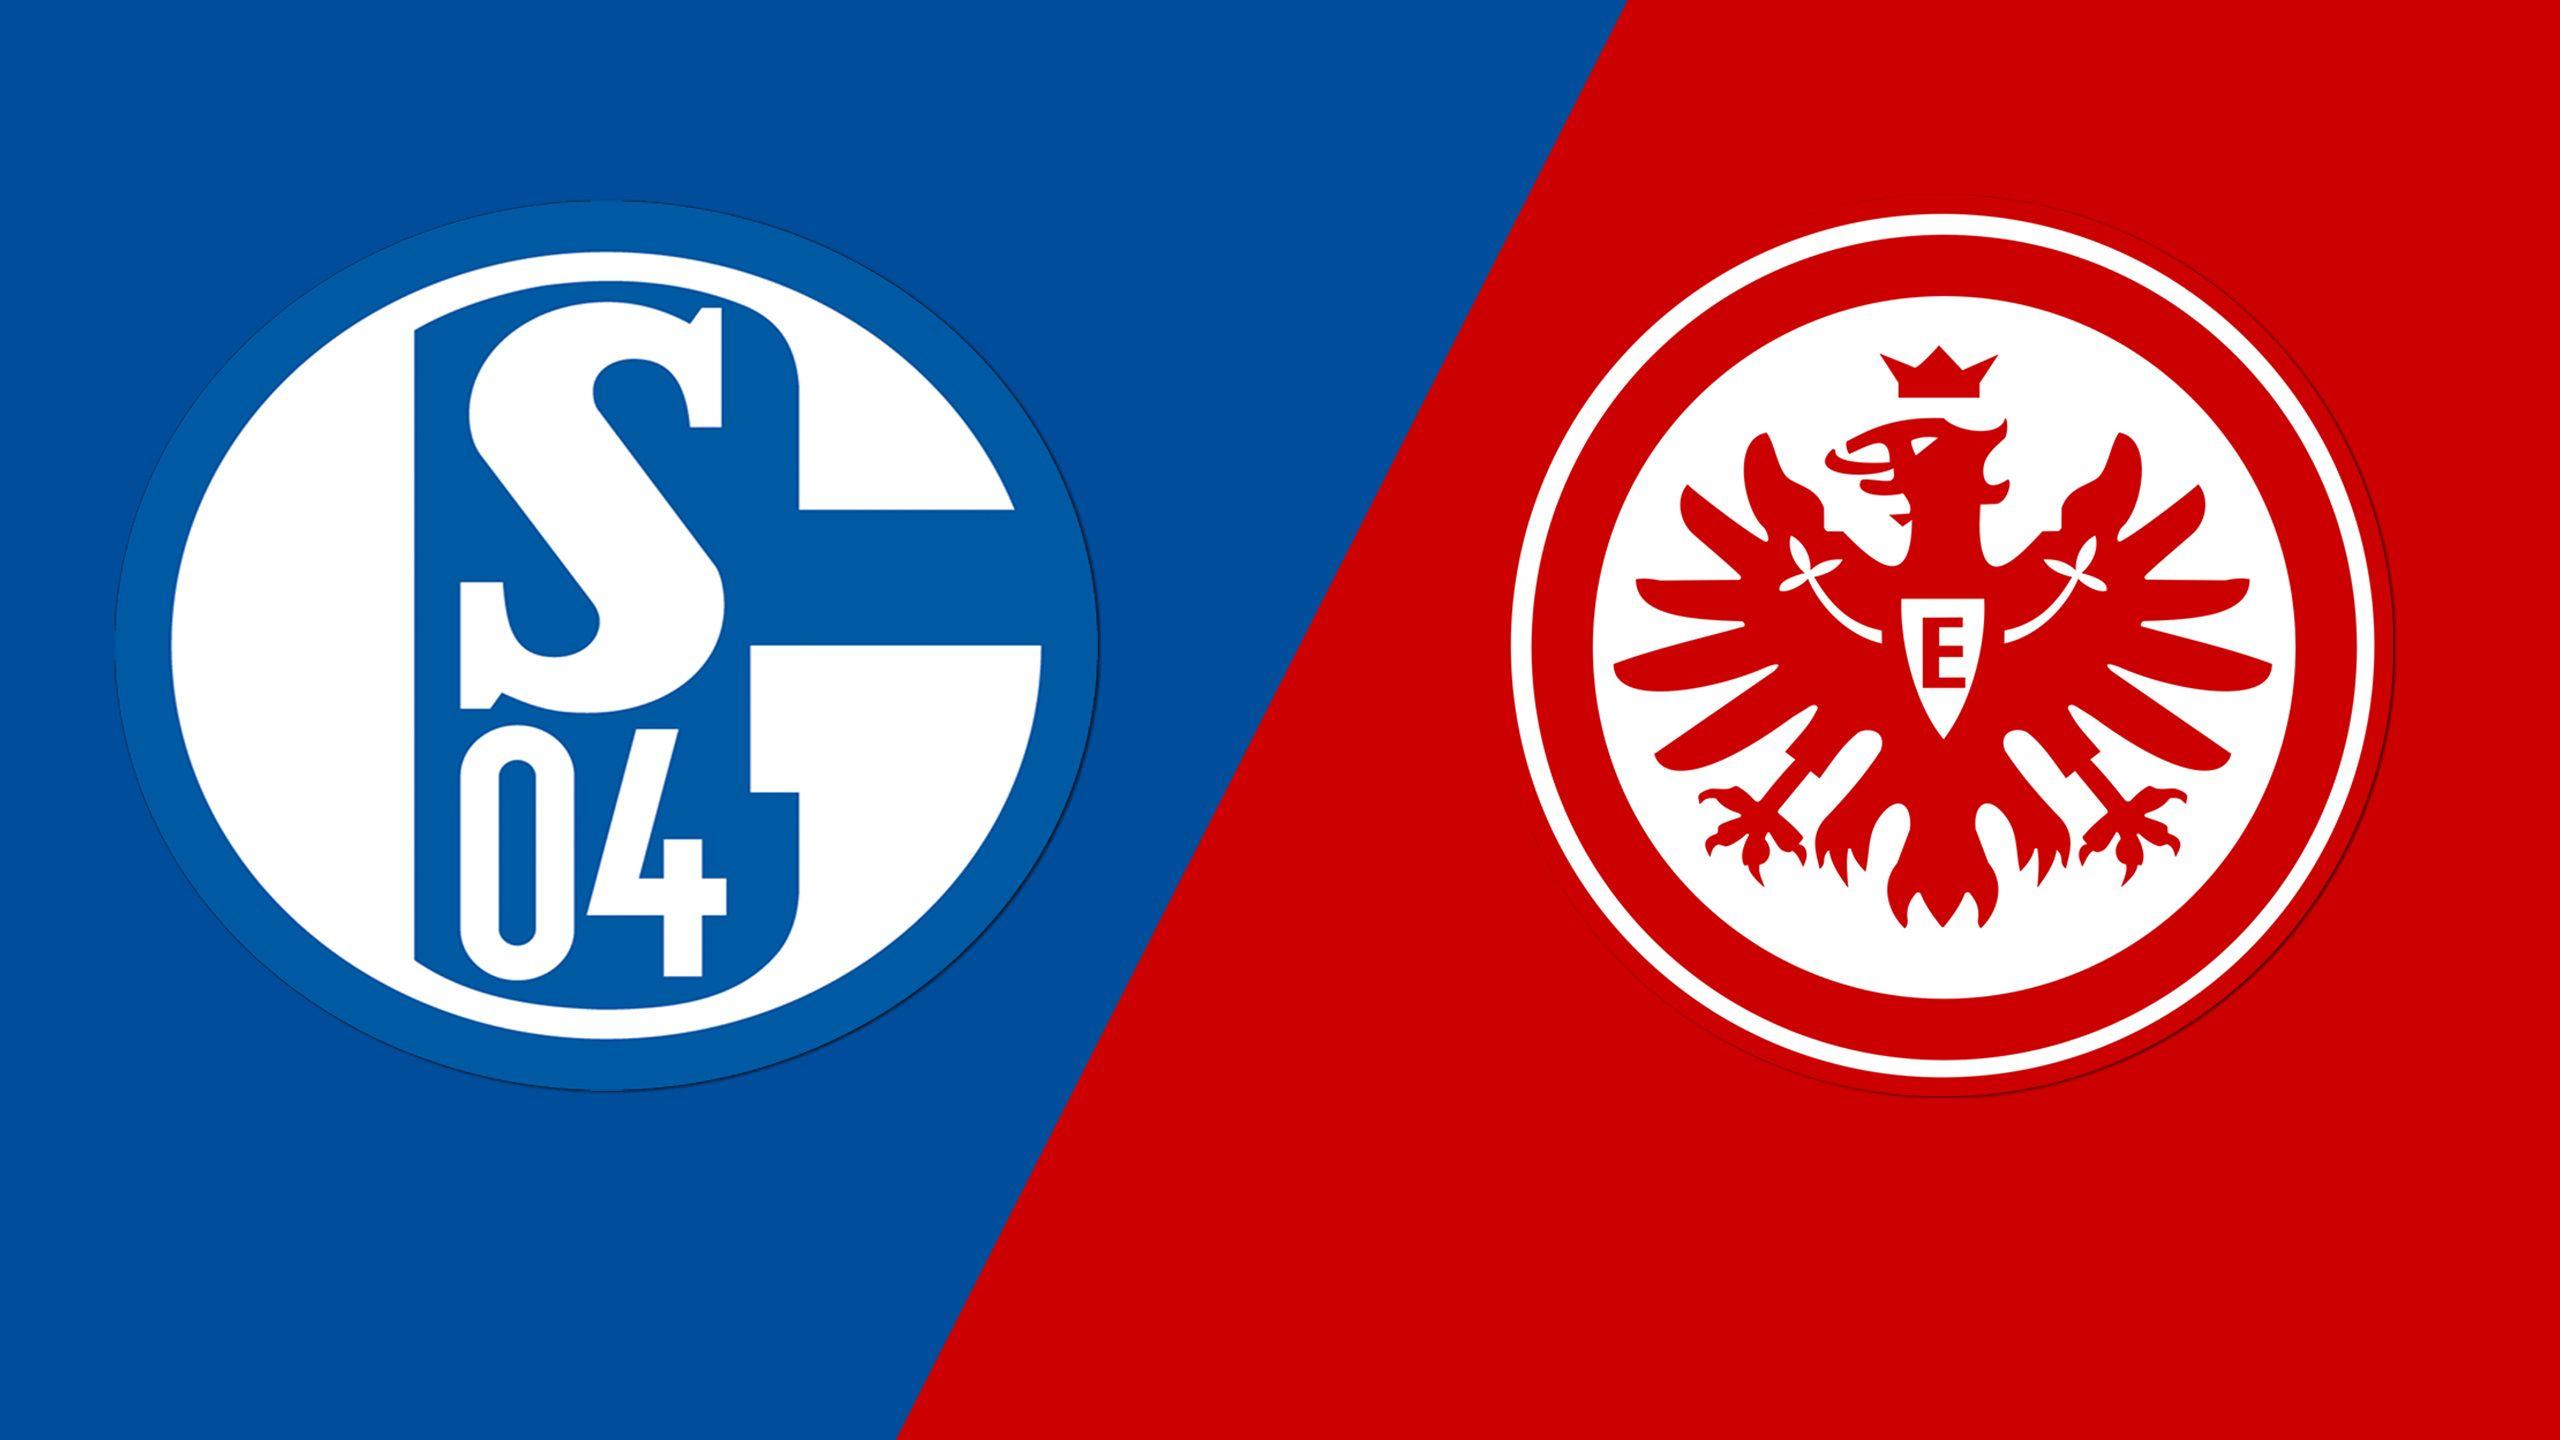 Schalke 04 vs. Eintracht Frankfurt (Semi-Finals) (German Cup)